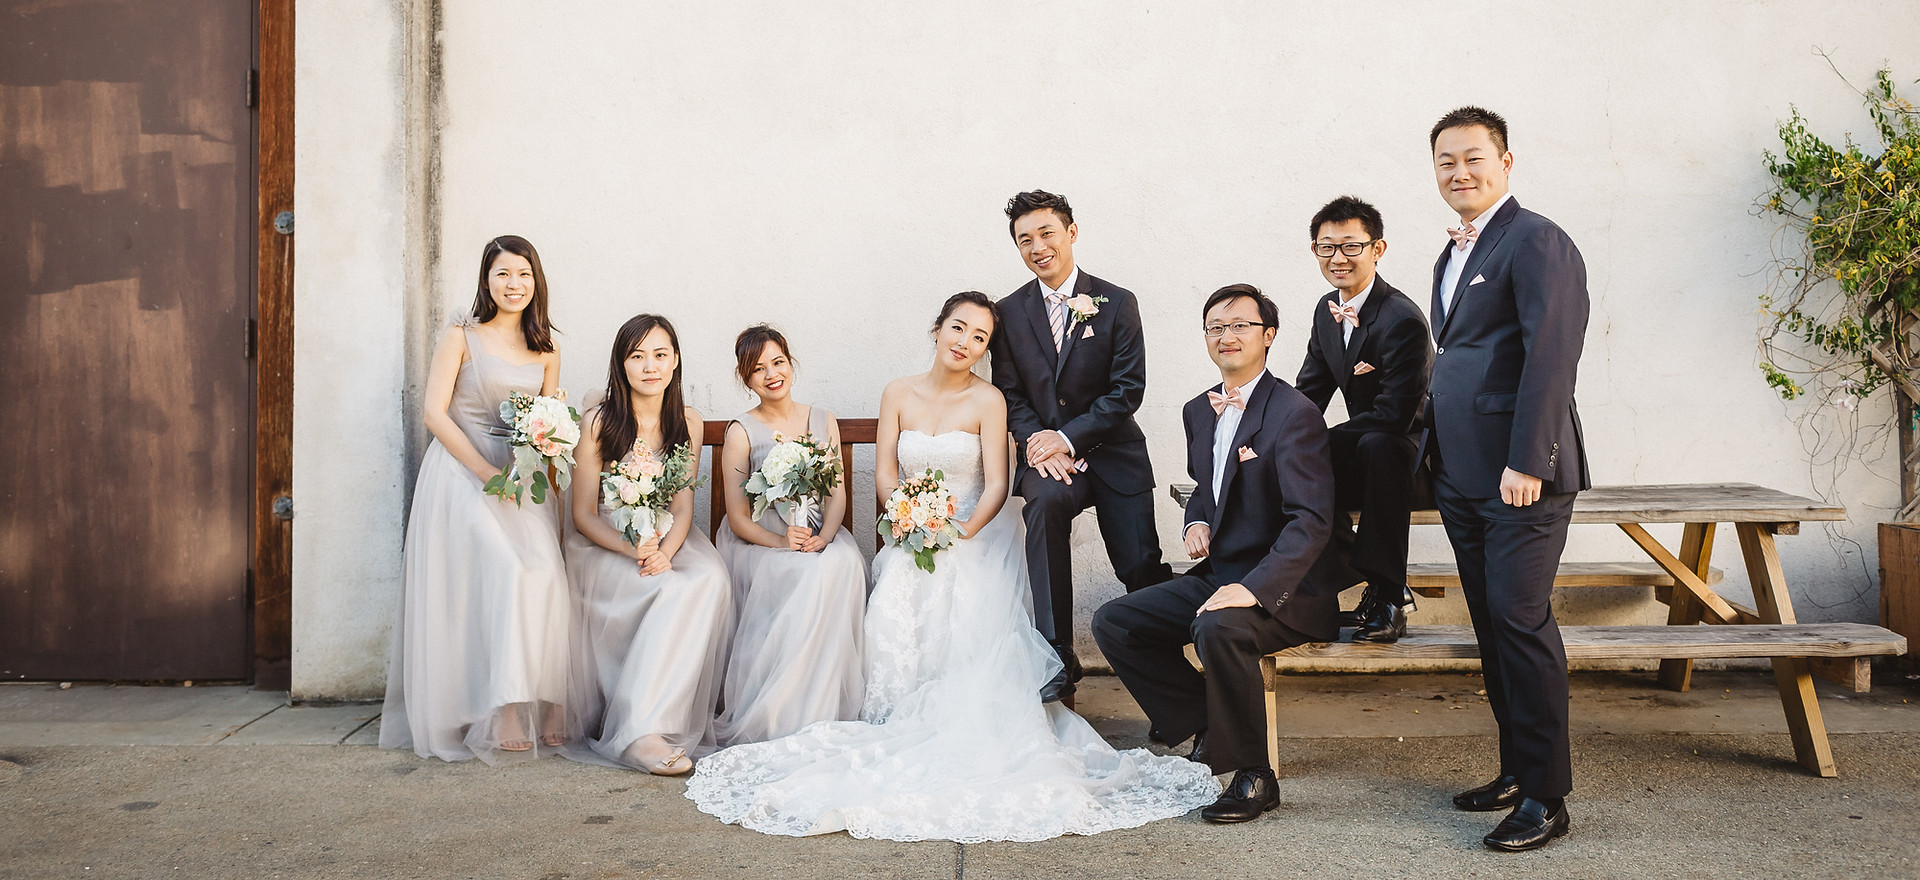 Rebecca + Allen Wedding - 20160508_18_27